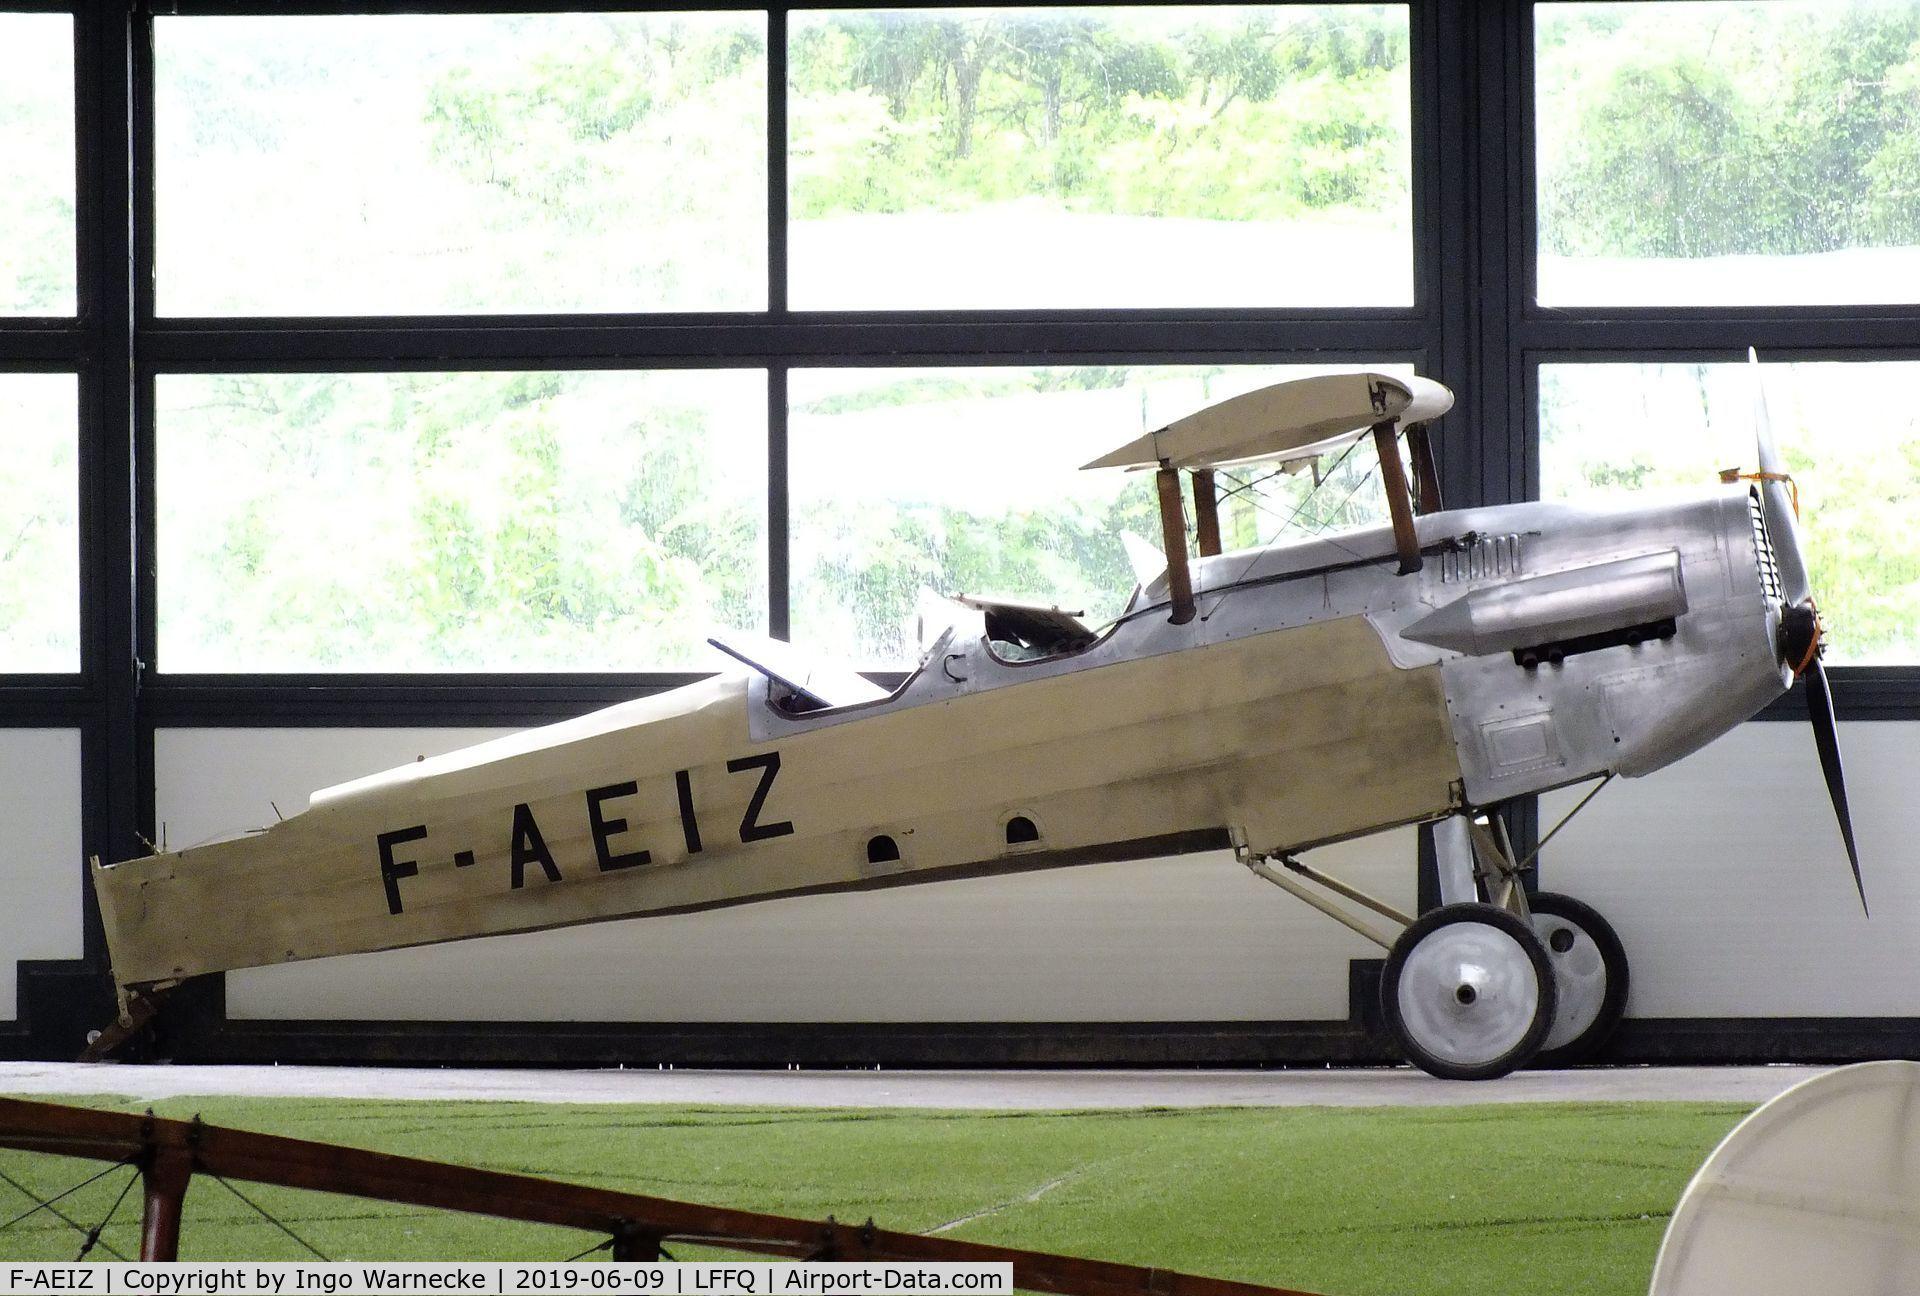 F-AEIZ, Potez 25 Replica C/N unknown_f-aeiz, Potez 25 replica at the Meeting Aerien 2019, La-Ferte-Alais